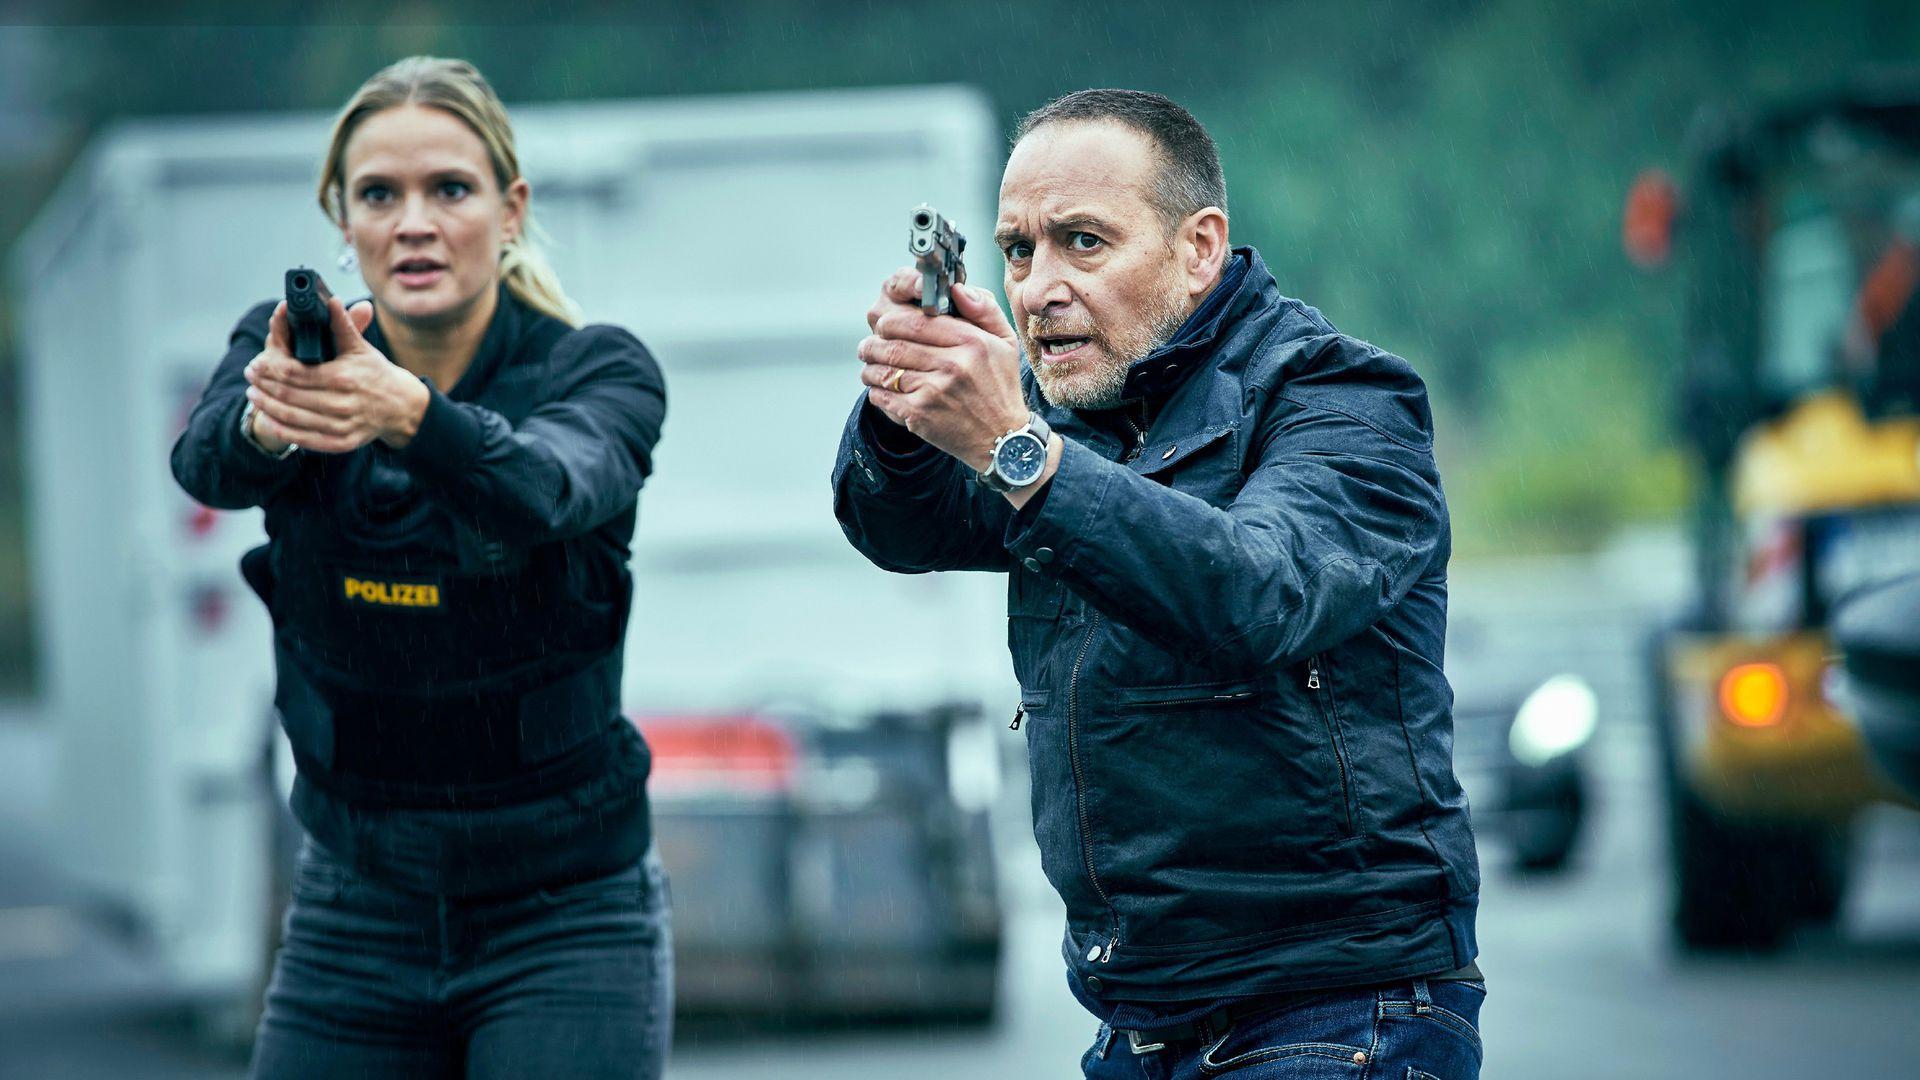 Mit neuem Cast: Alarm für Cobra 11 feiert Mega-Auftakt